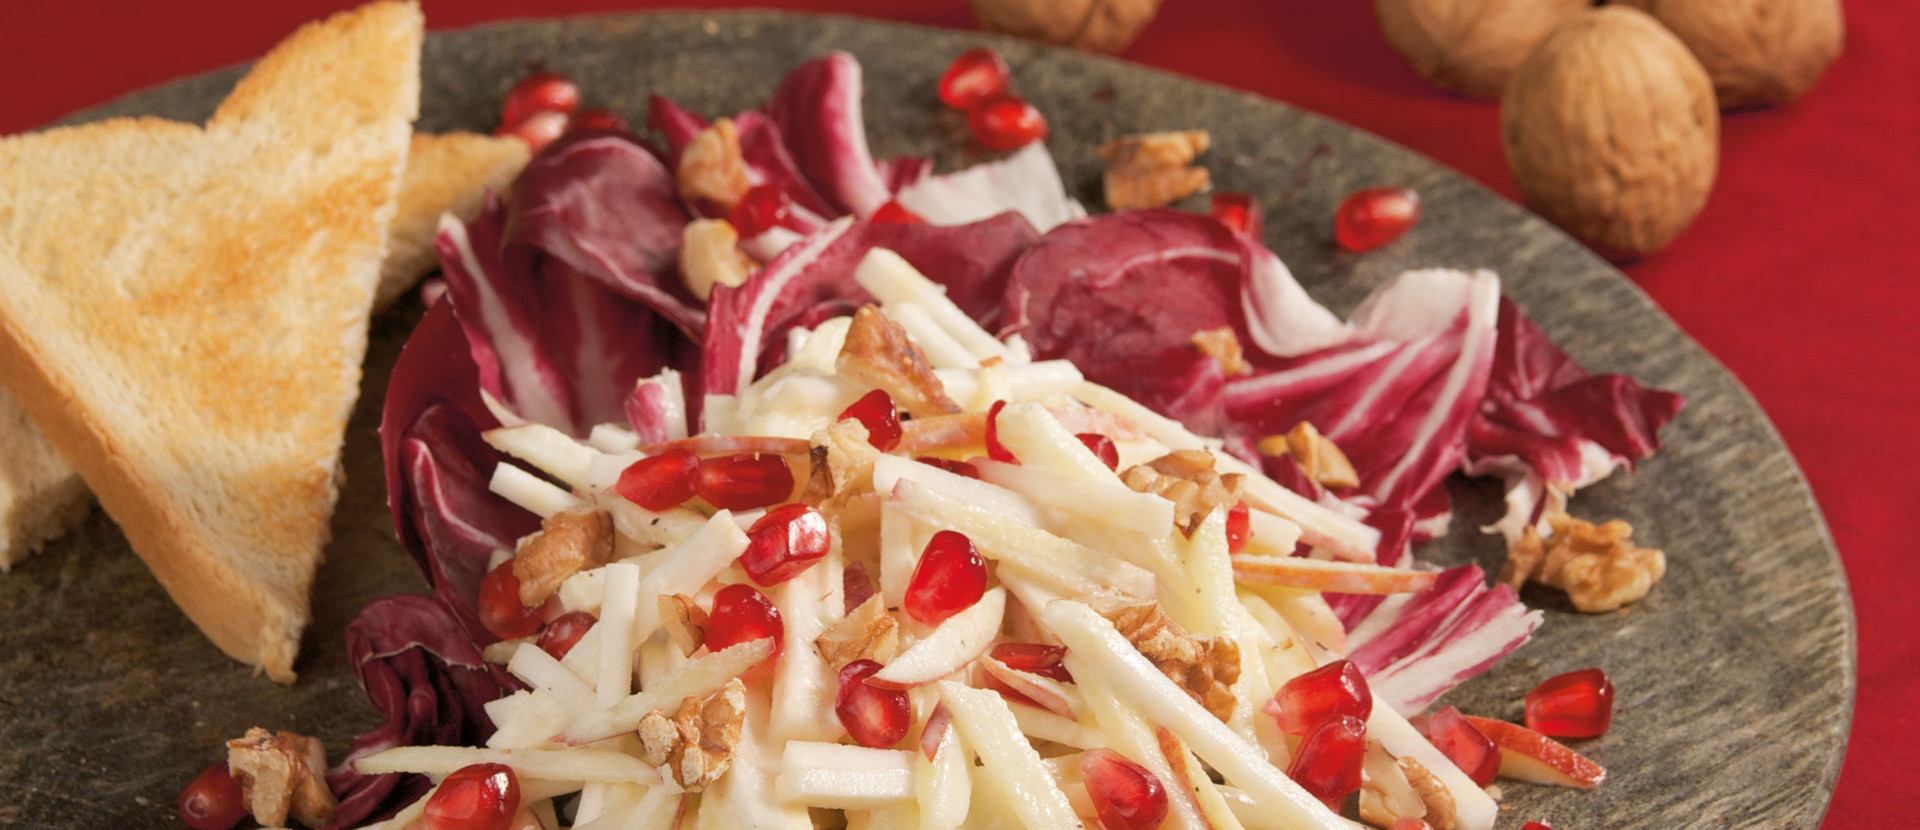 Granatapfel Waldorfsalat auf Radicchio